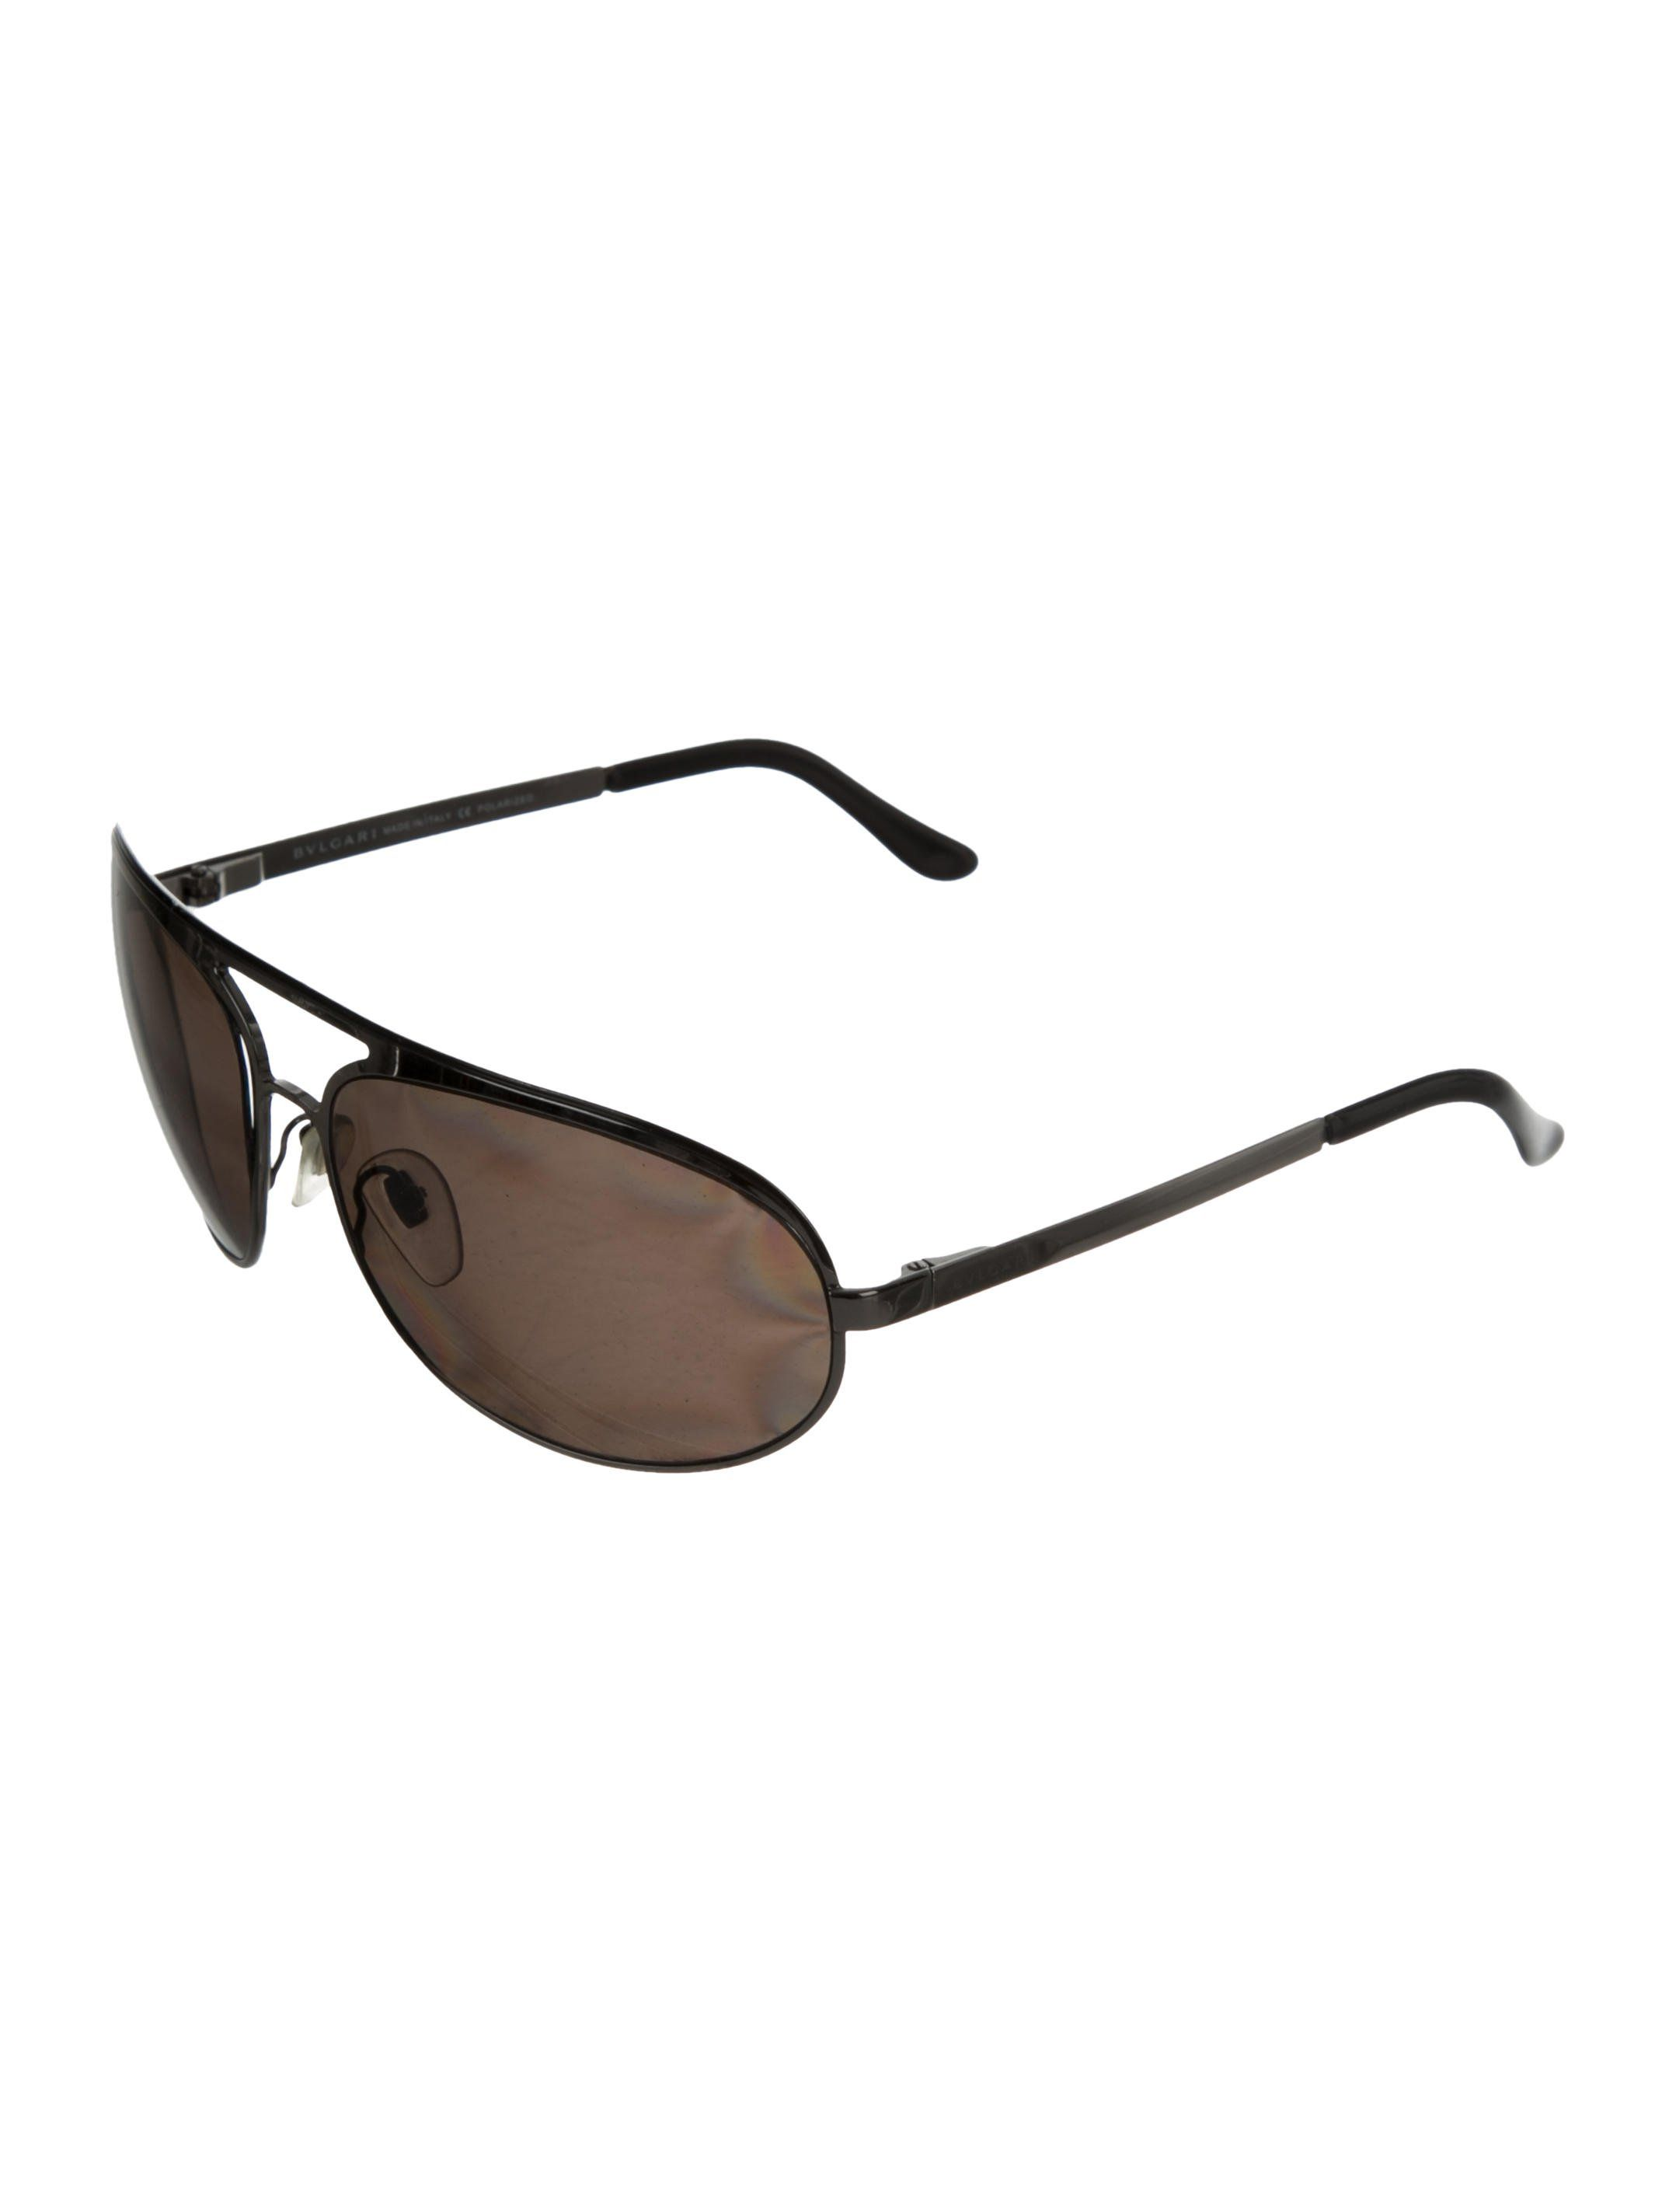 bcd2a67513 Bvlgari Sunglasses For Men Bv7013